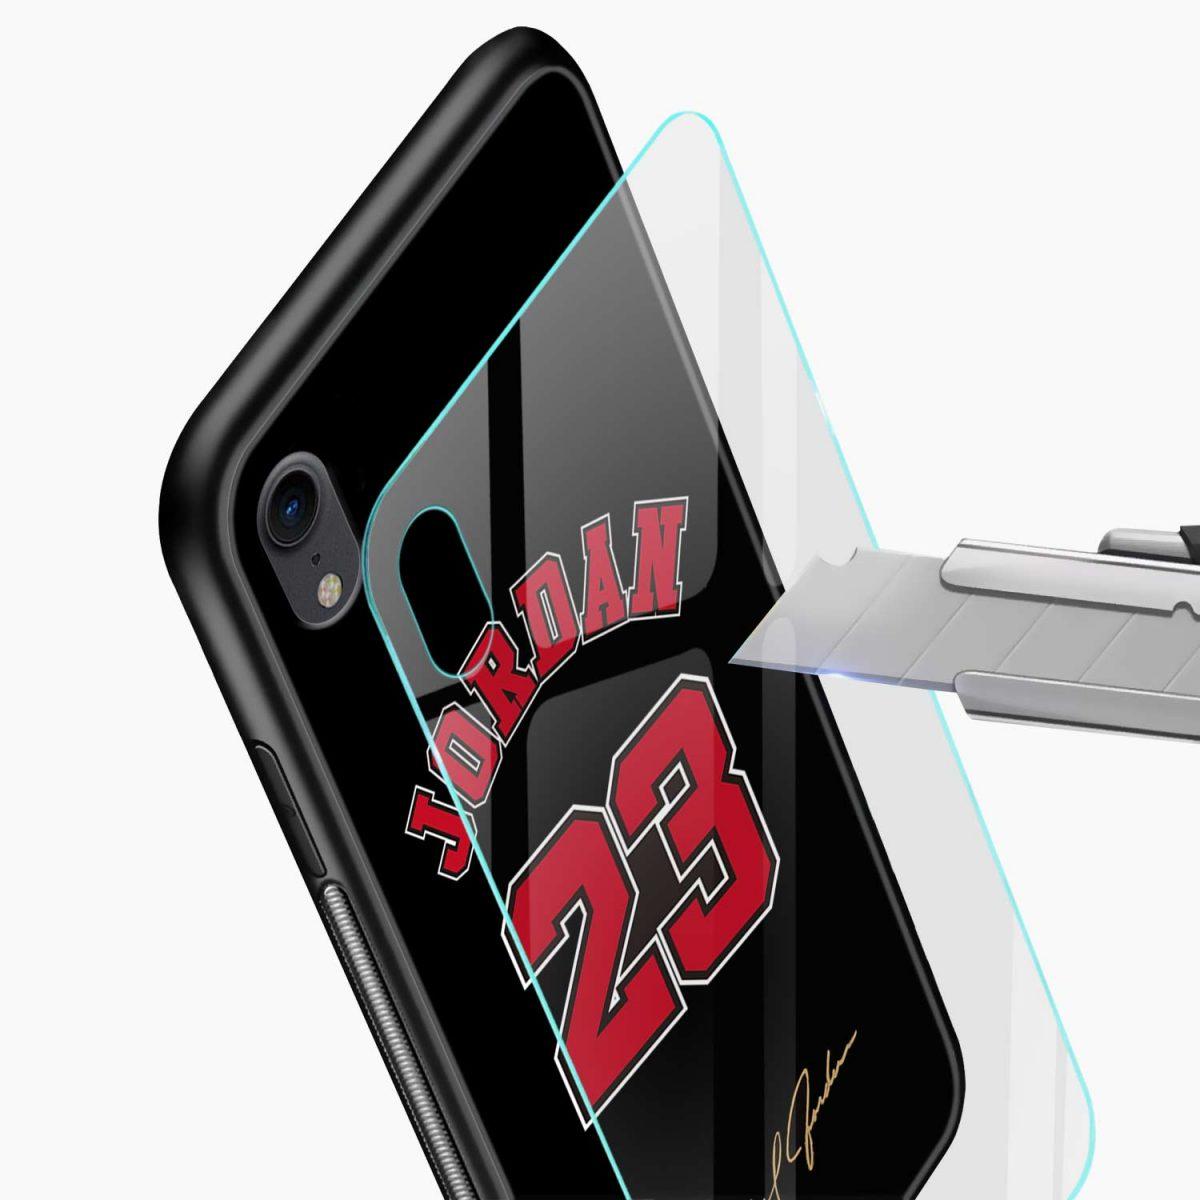 jordan 23 apple iphone xr back cover glass view